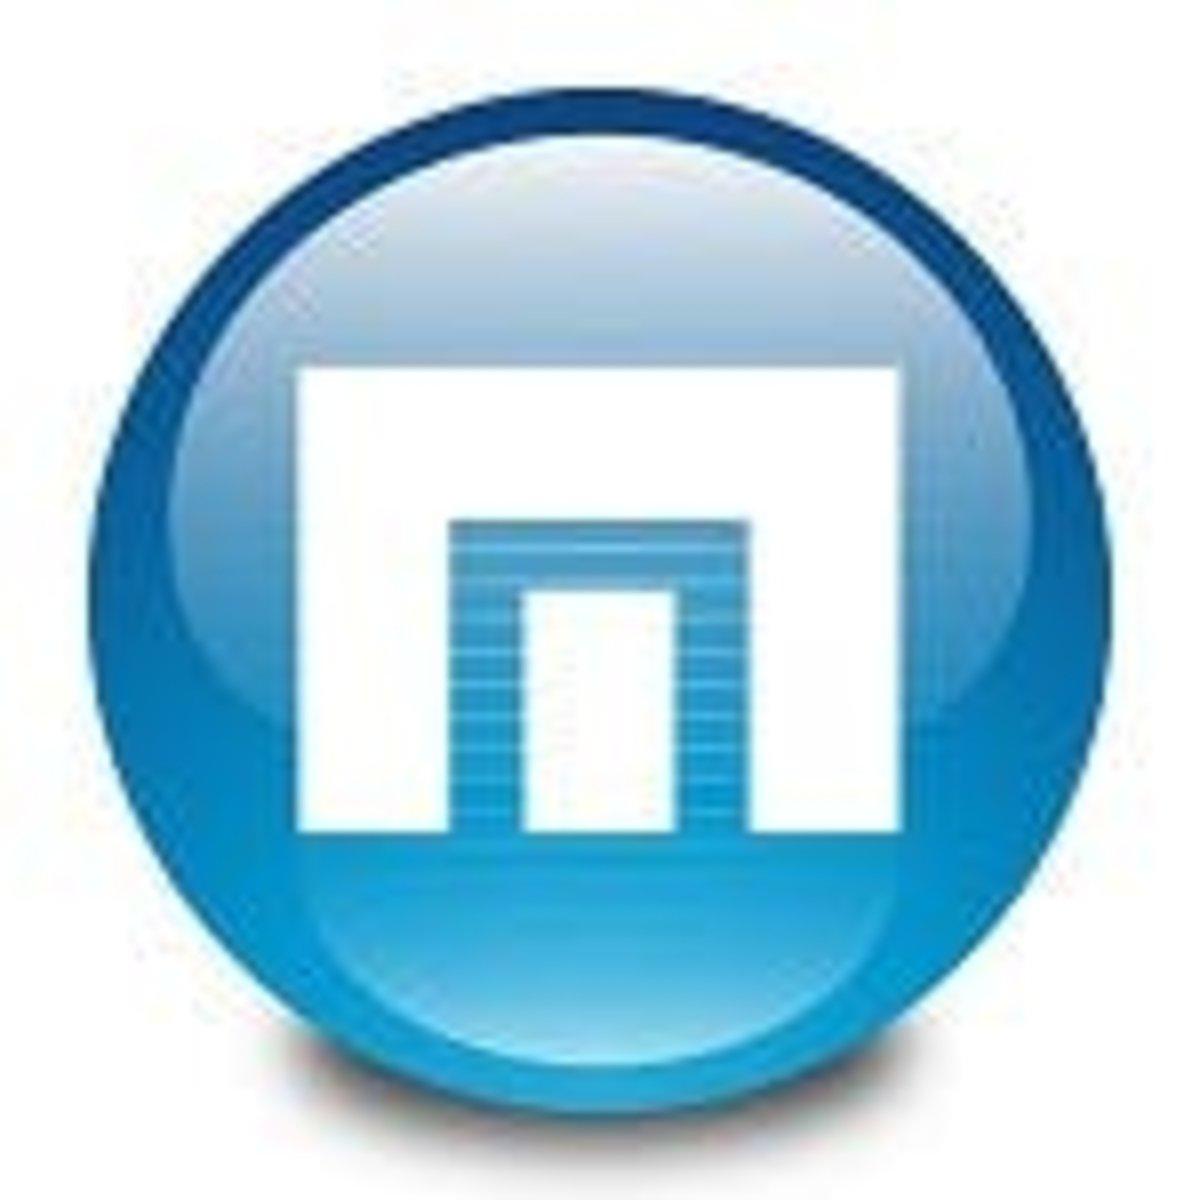 Maxthon-Browser-logo